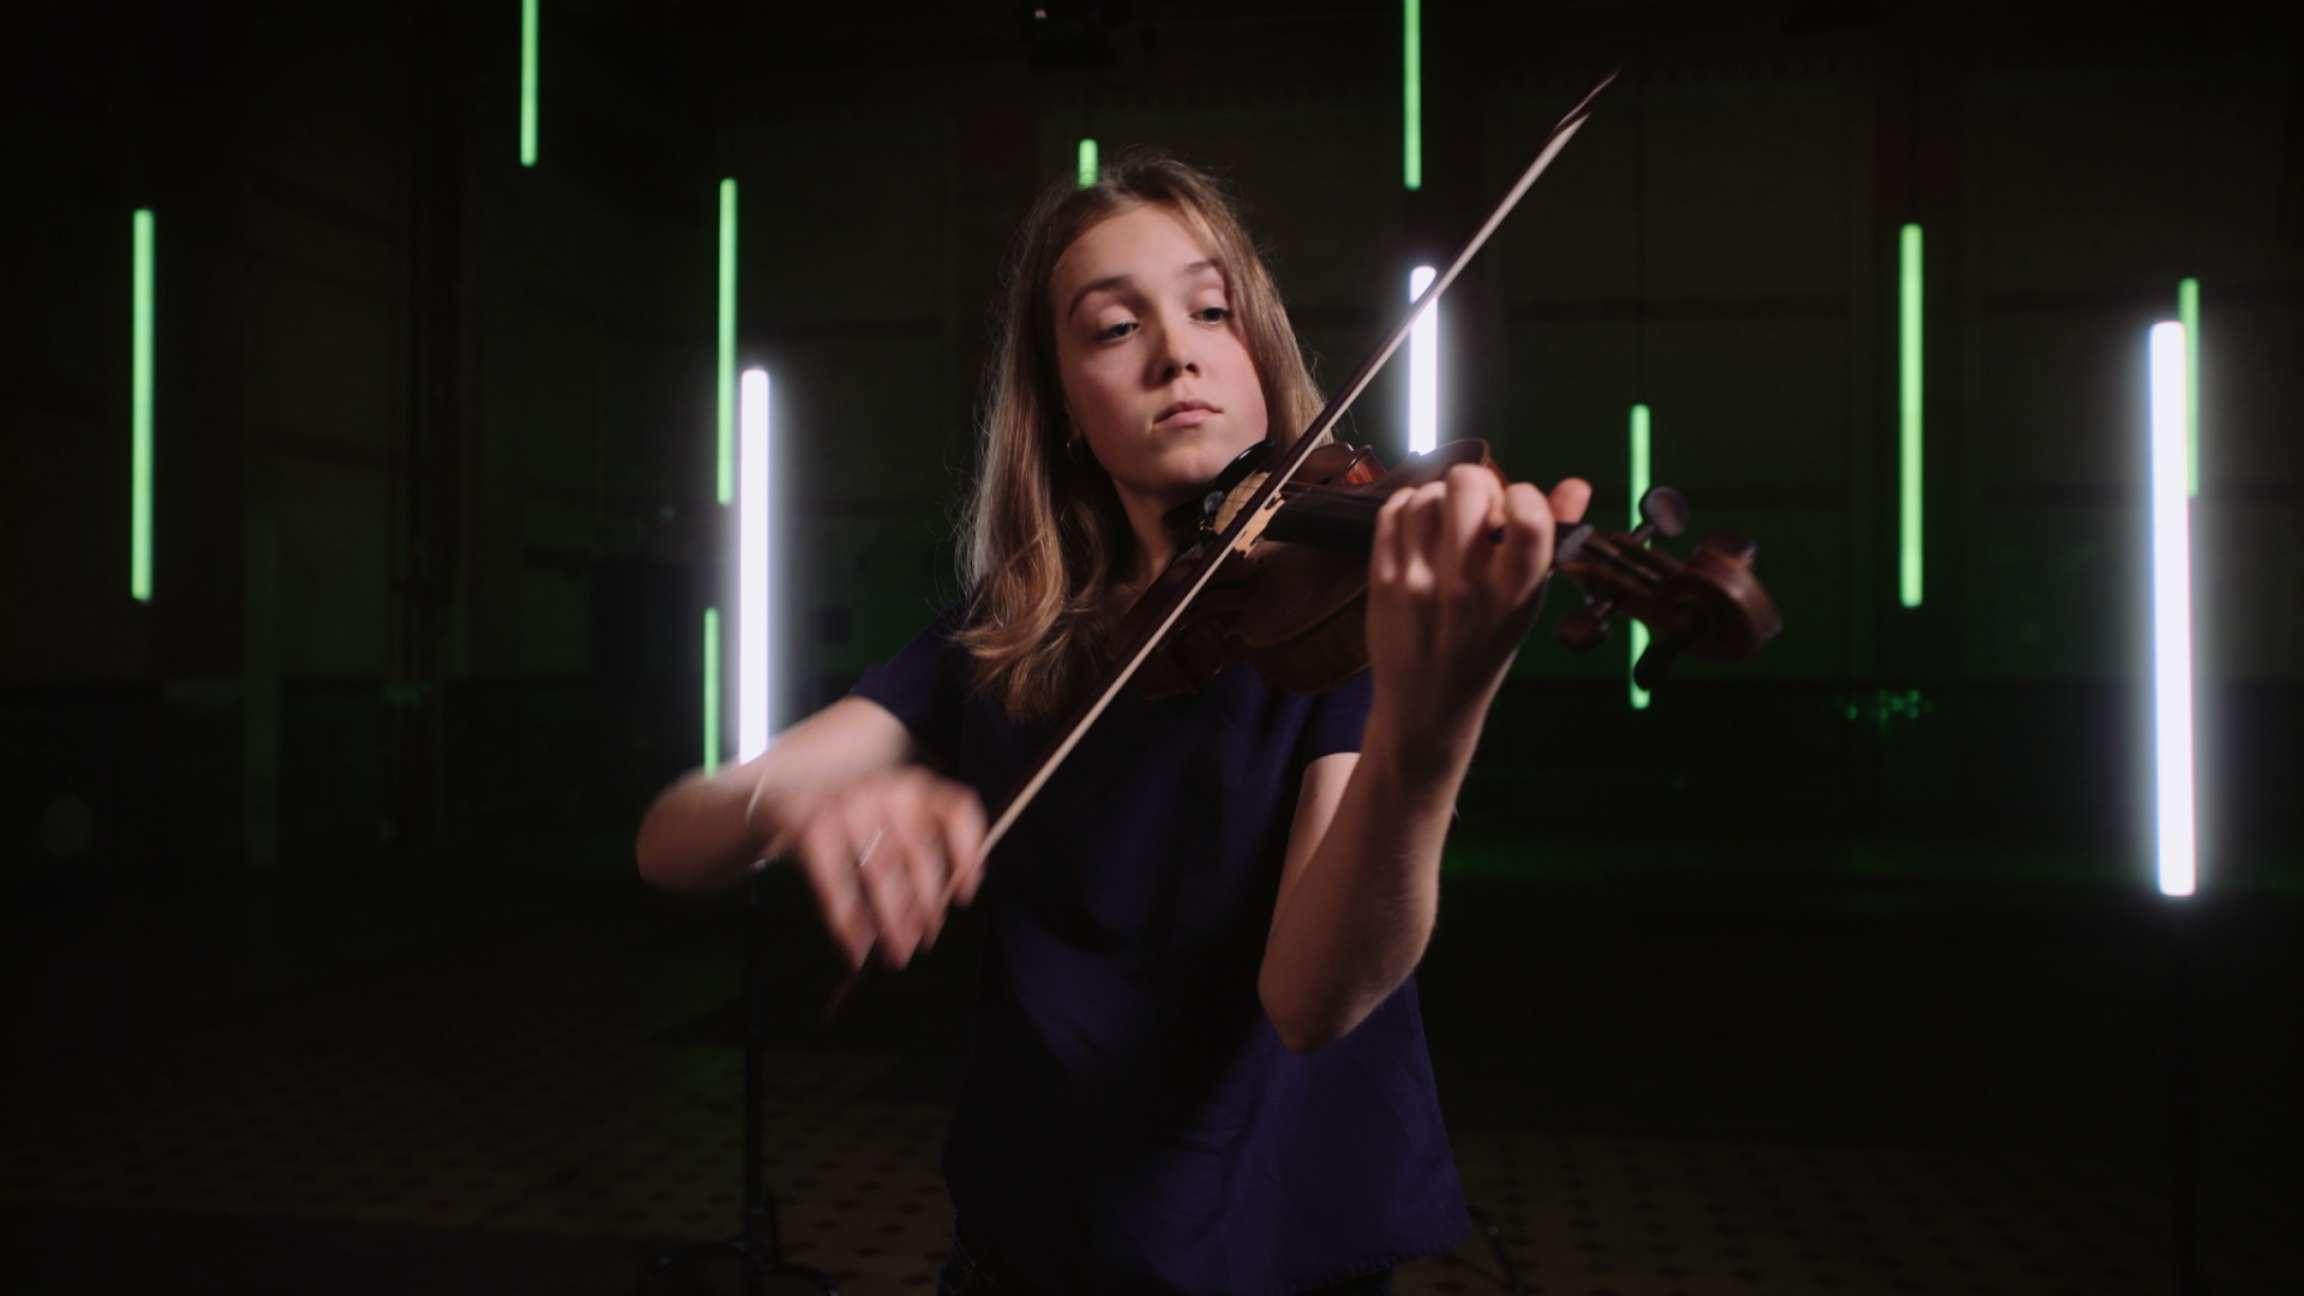 Largo from Violin sonata no. 3 in C major